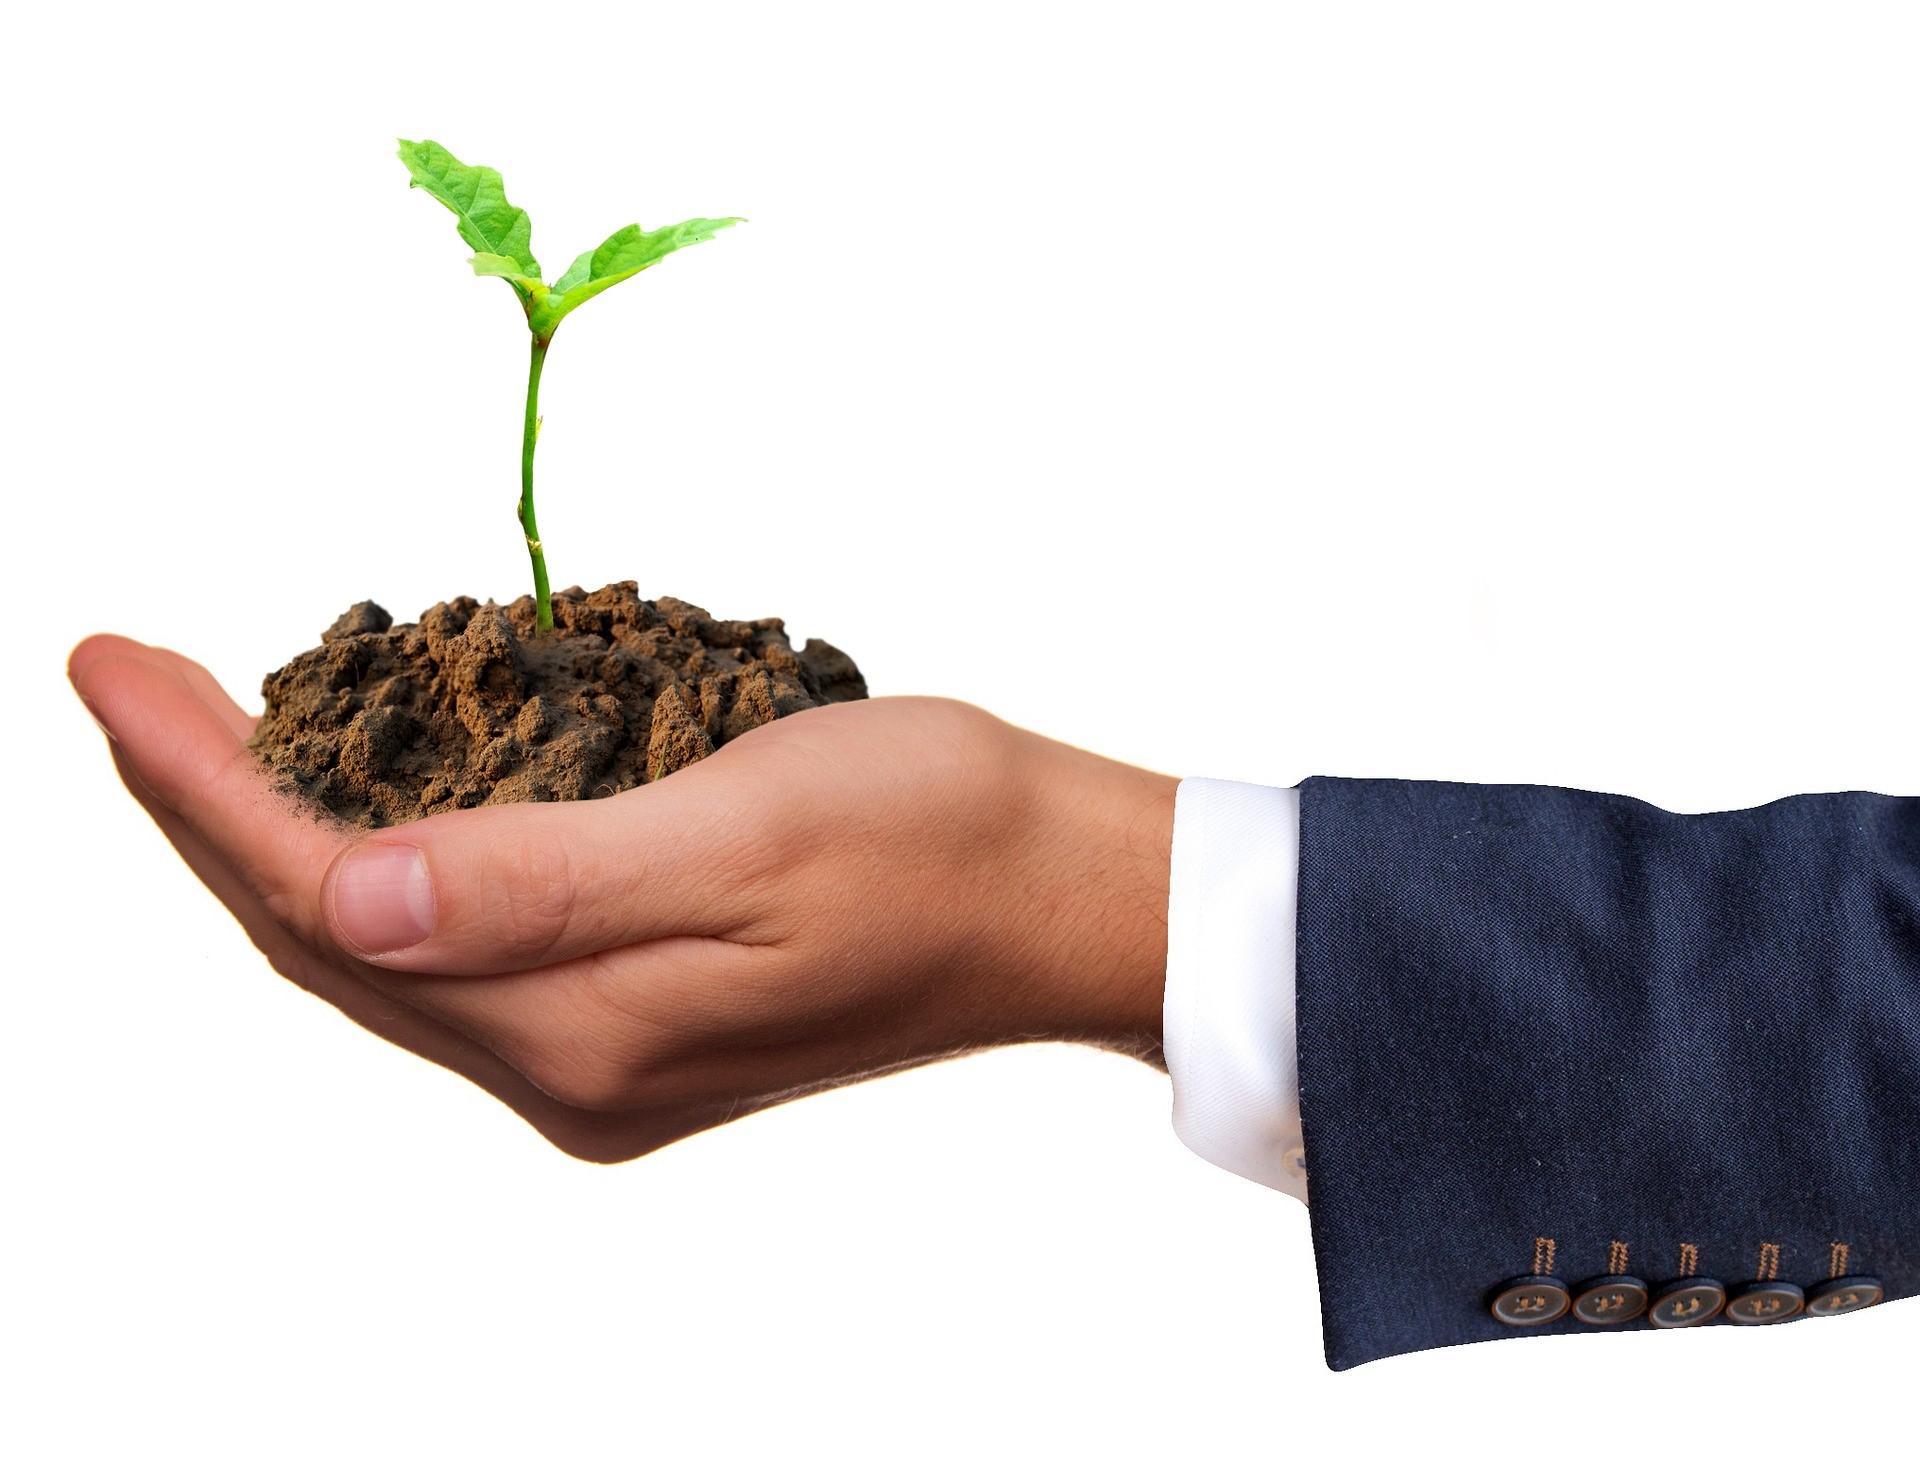 man holding plant